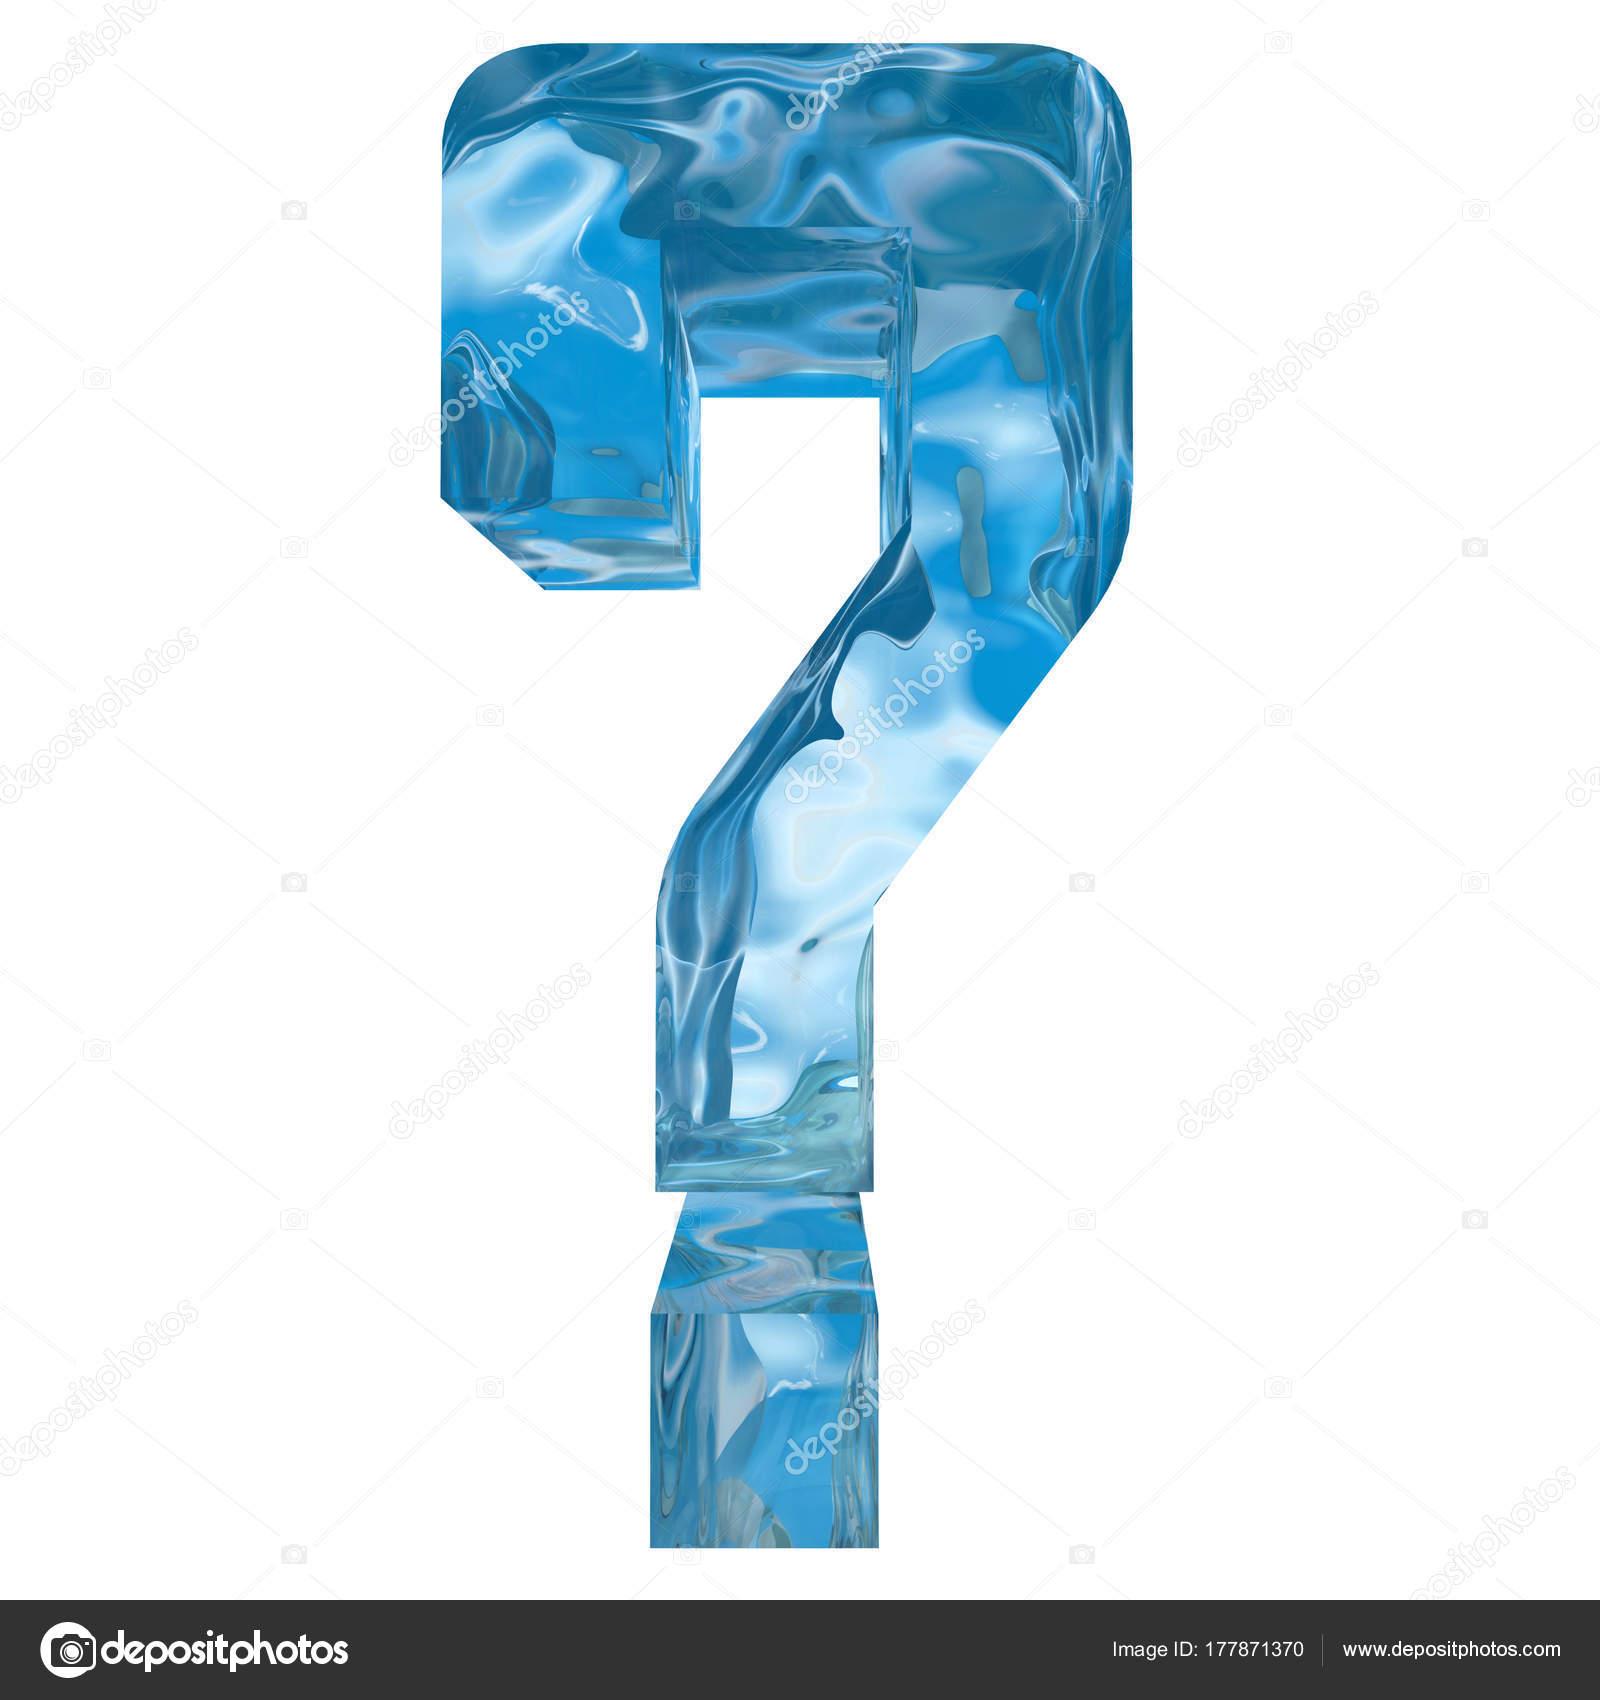 Conceptual Decorative Blue Cool Crystal Frozen Liquid Question Mark